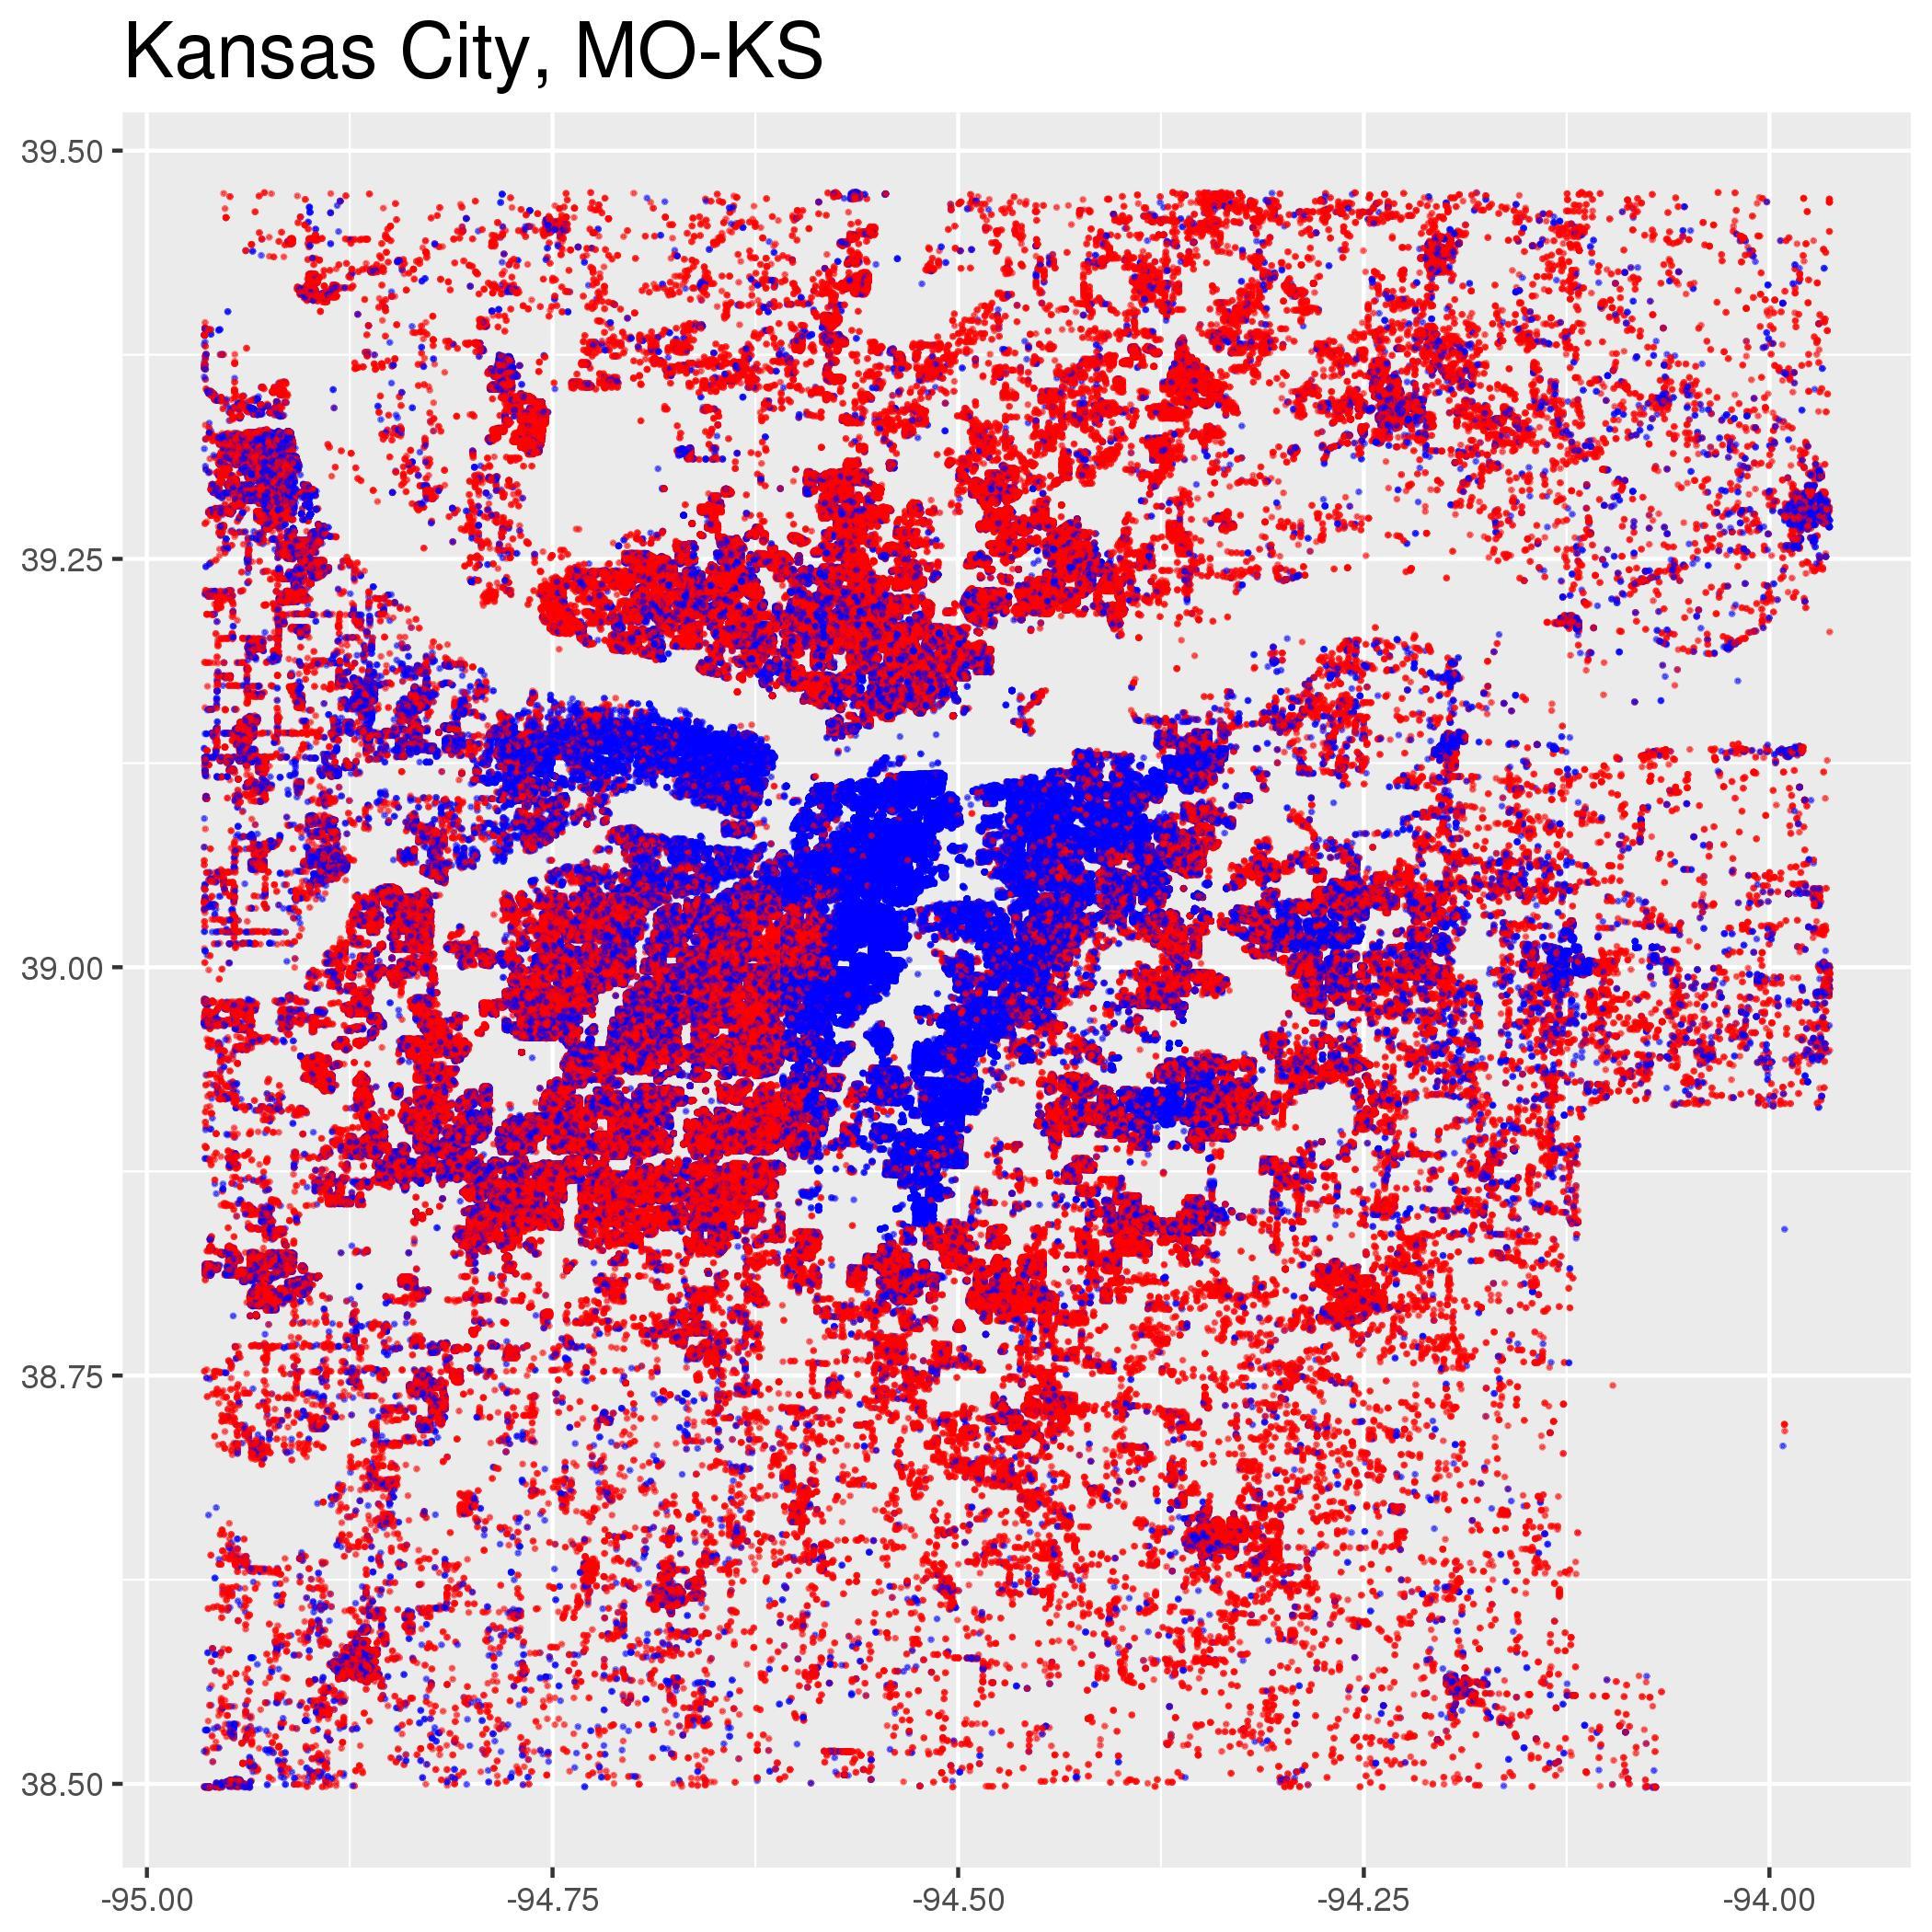 KansasCityMO-KS.jpeg